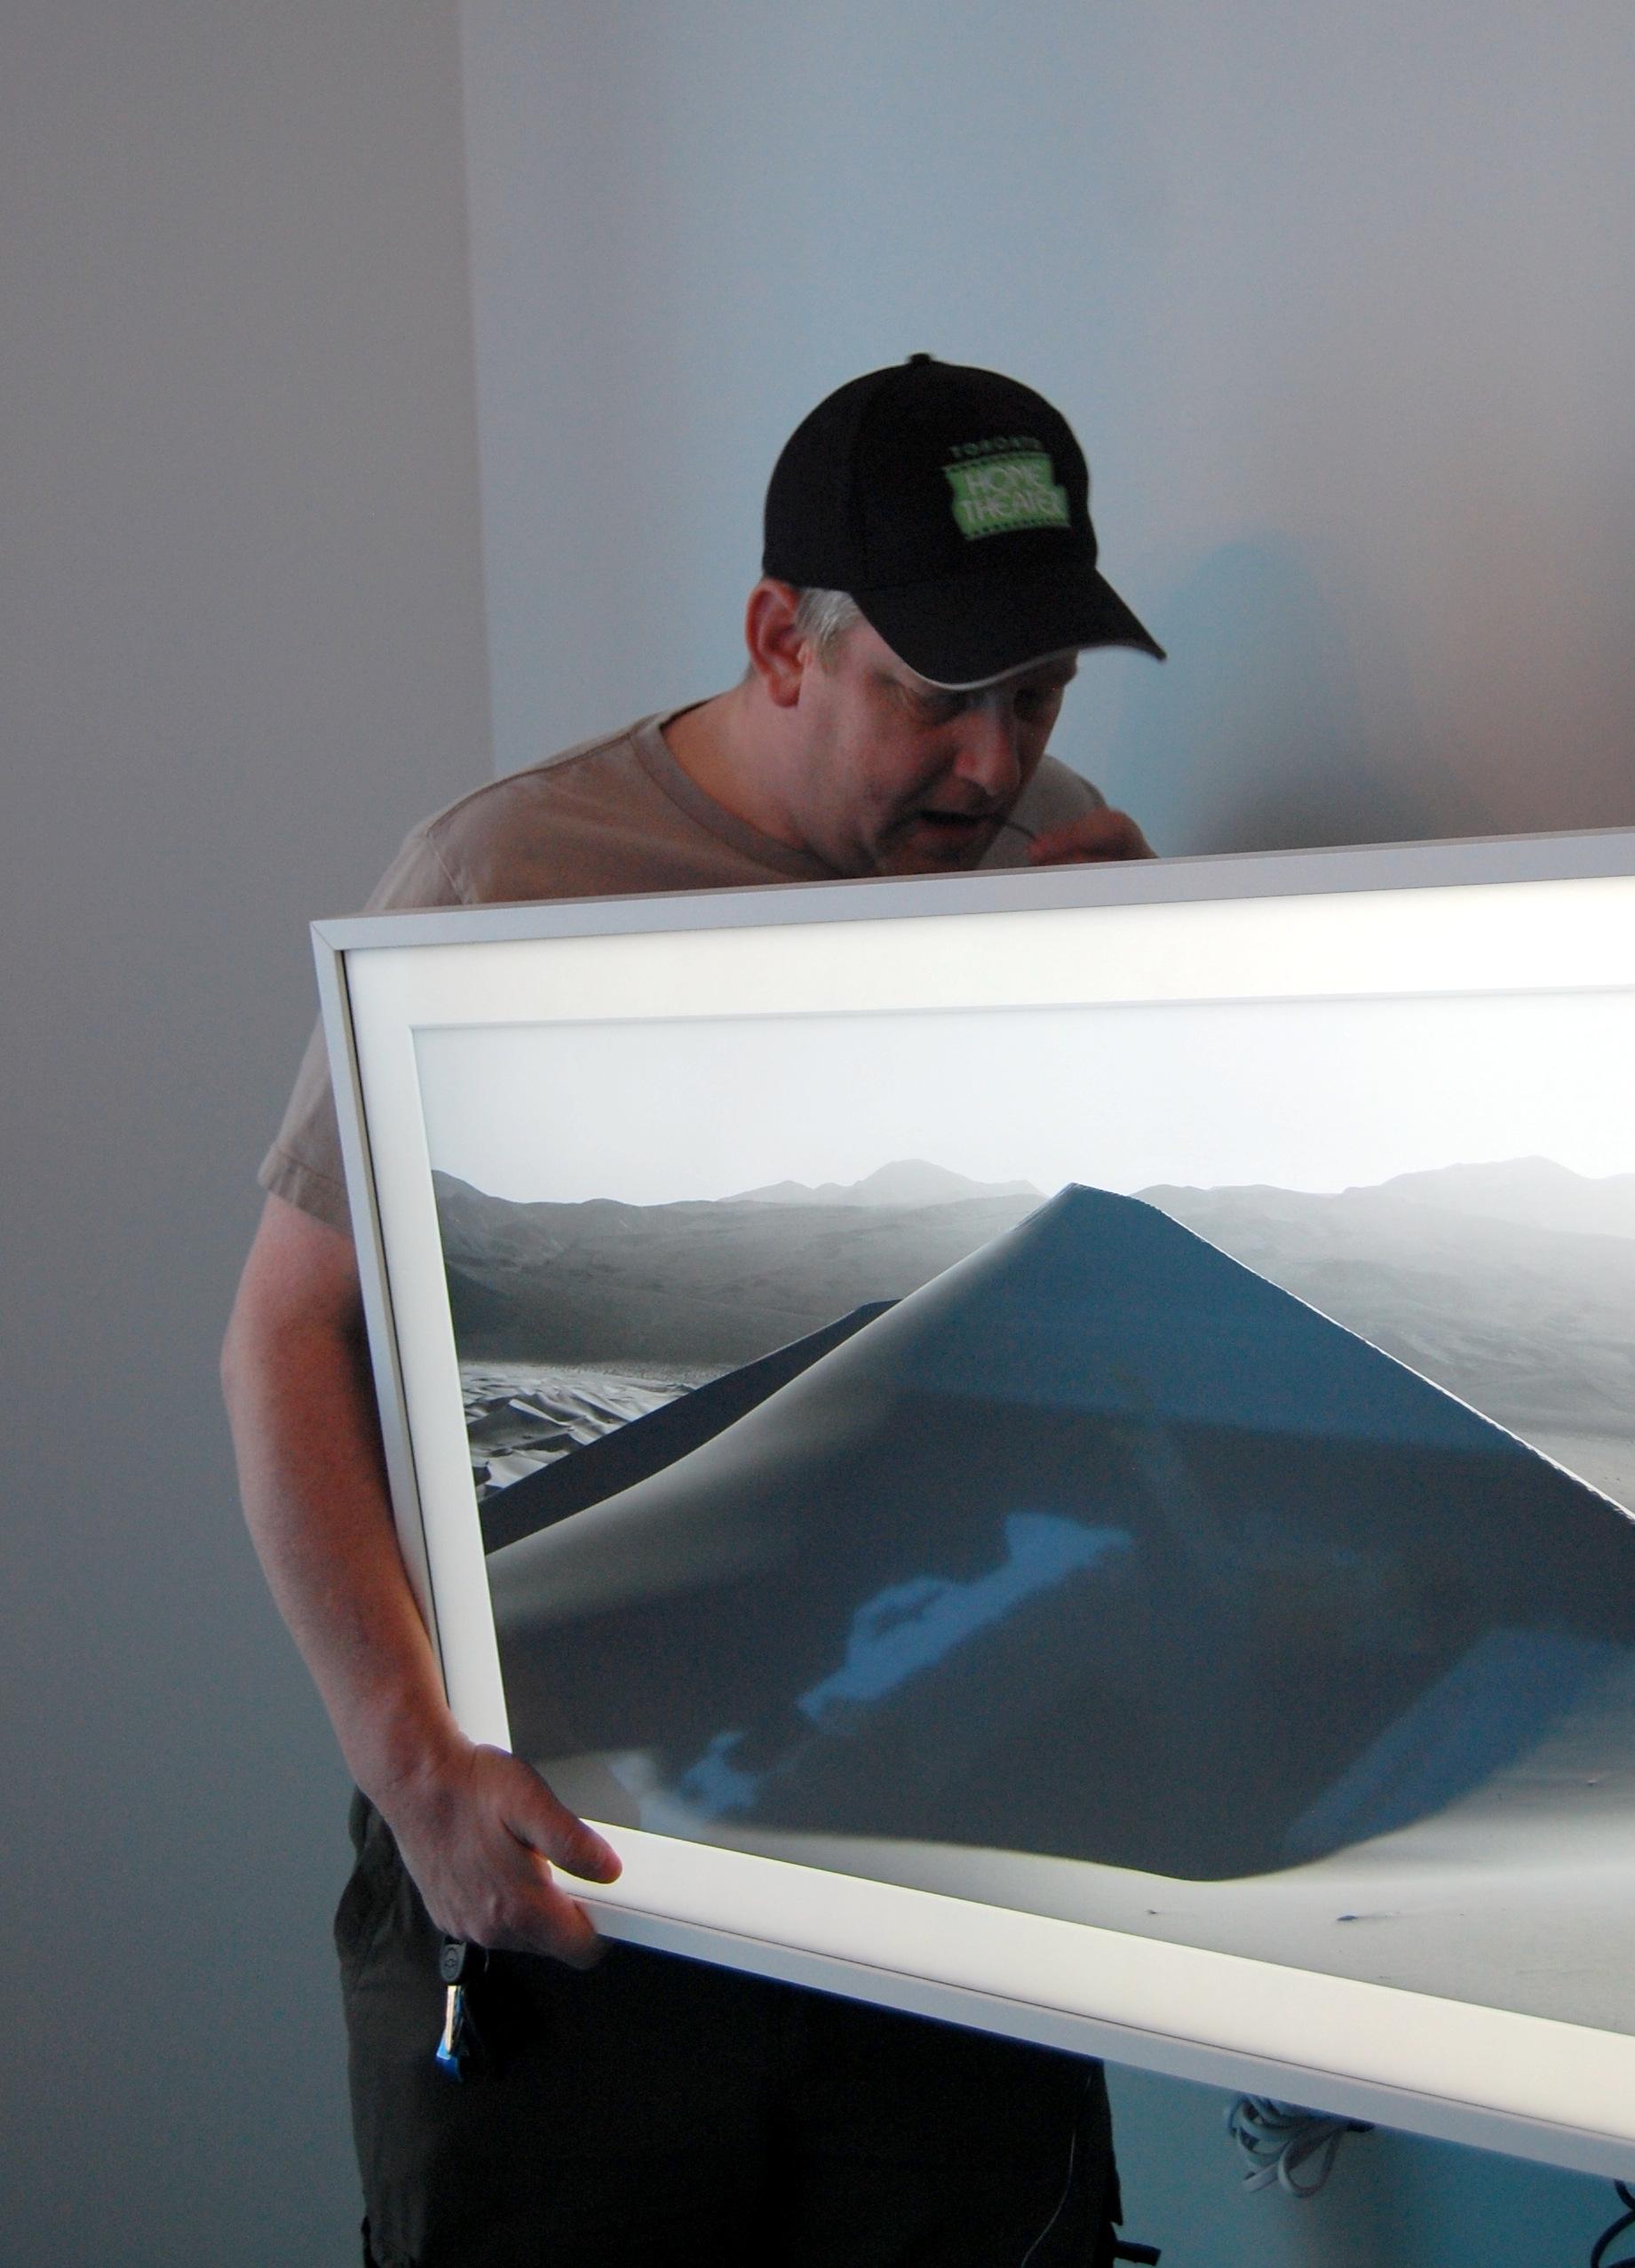 Mike Widerman Installing Samsung Frame